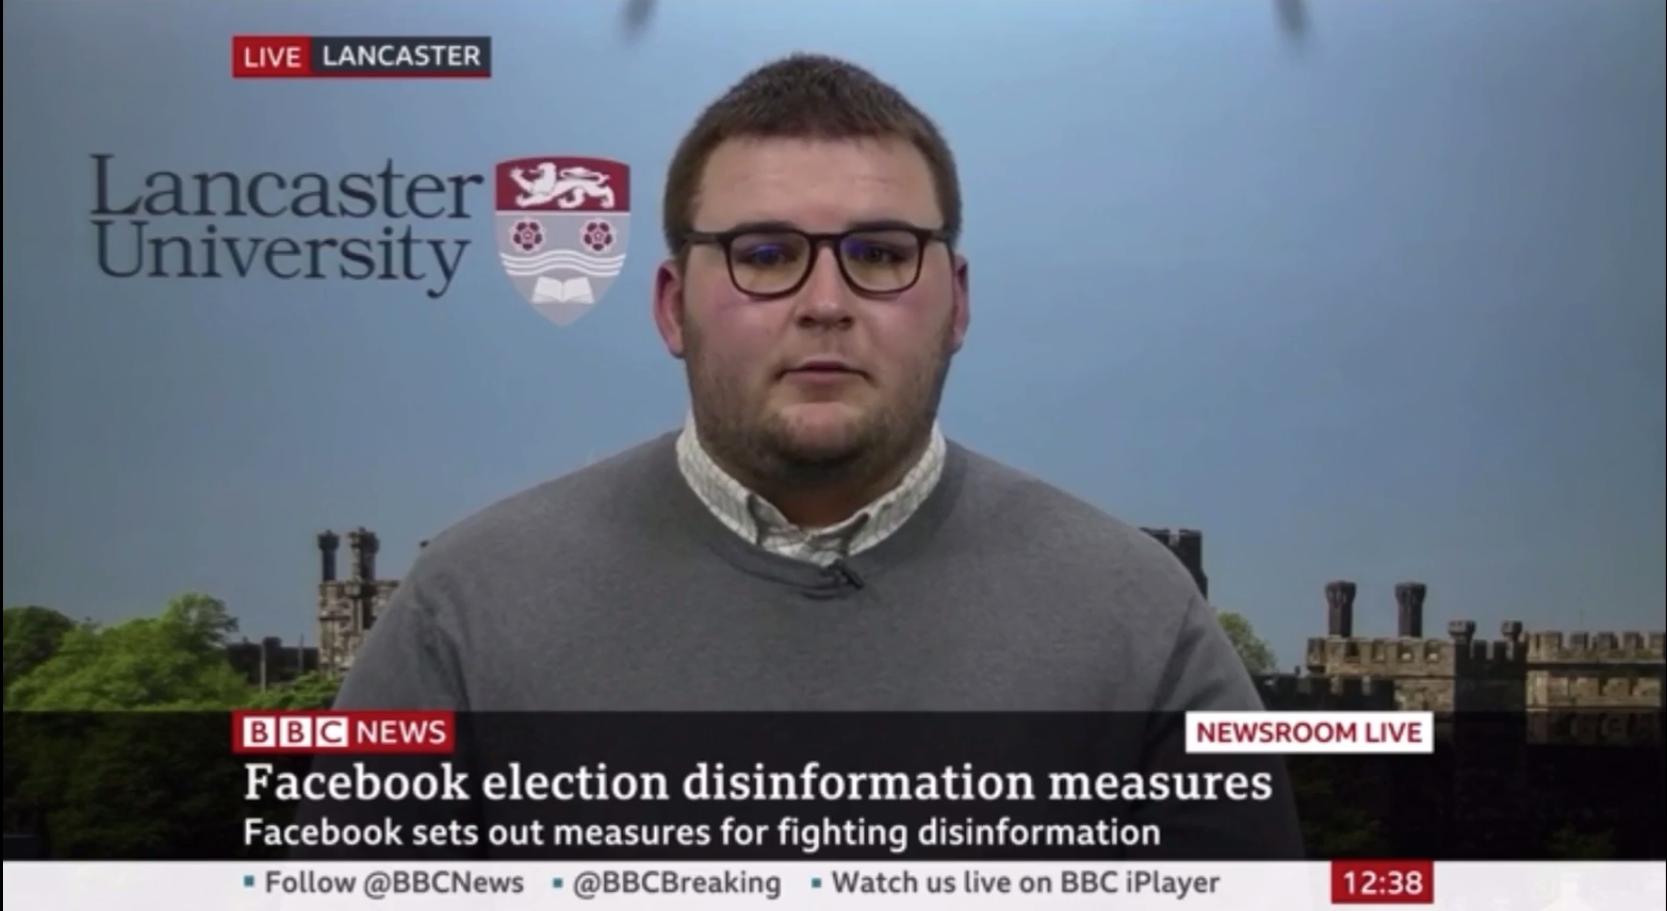 bbc_live_interview_191022_2